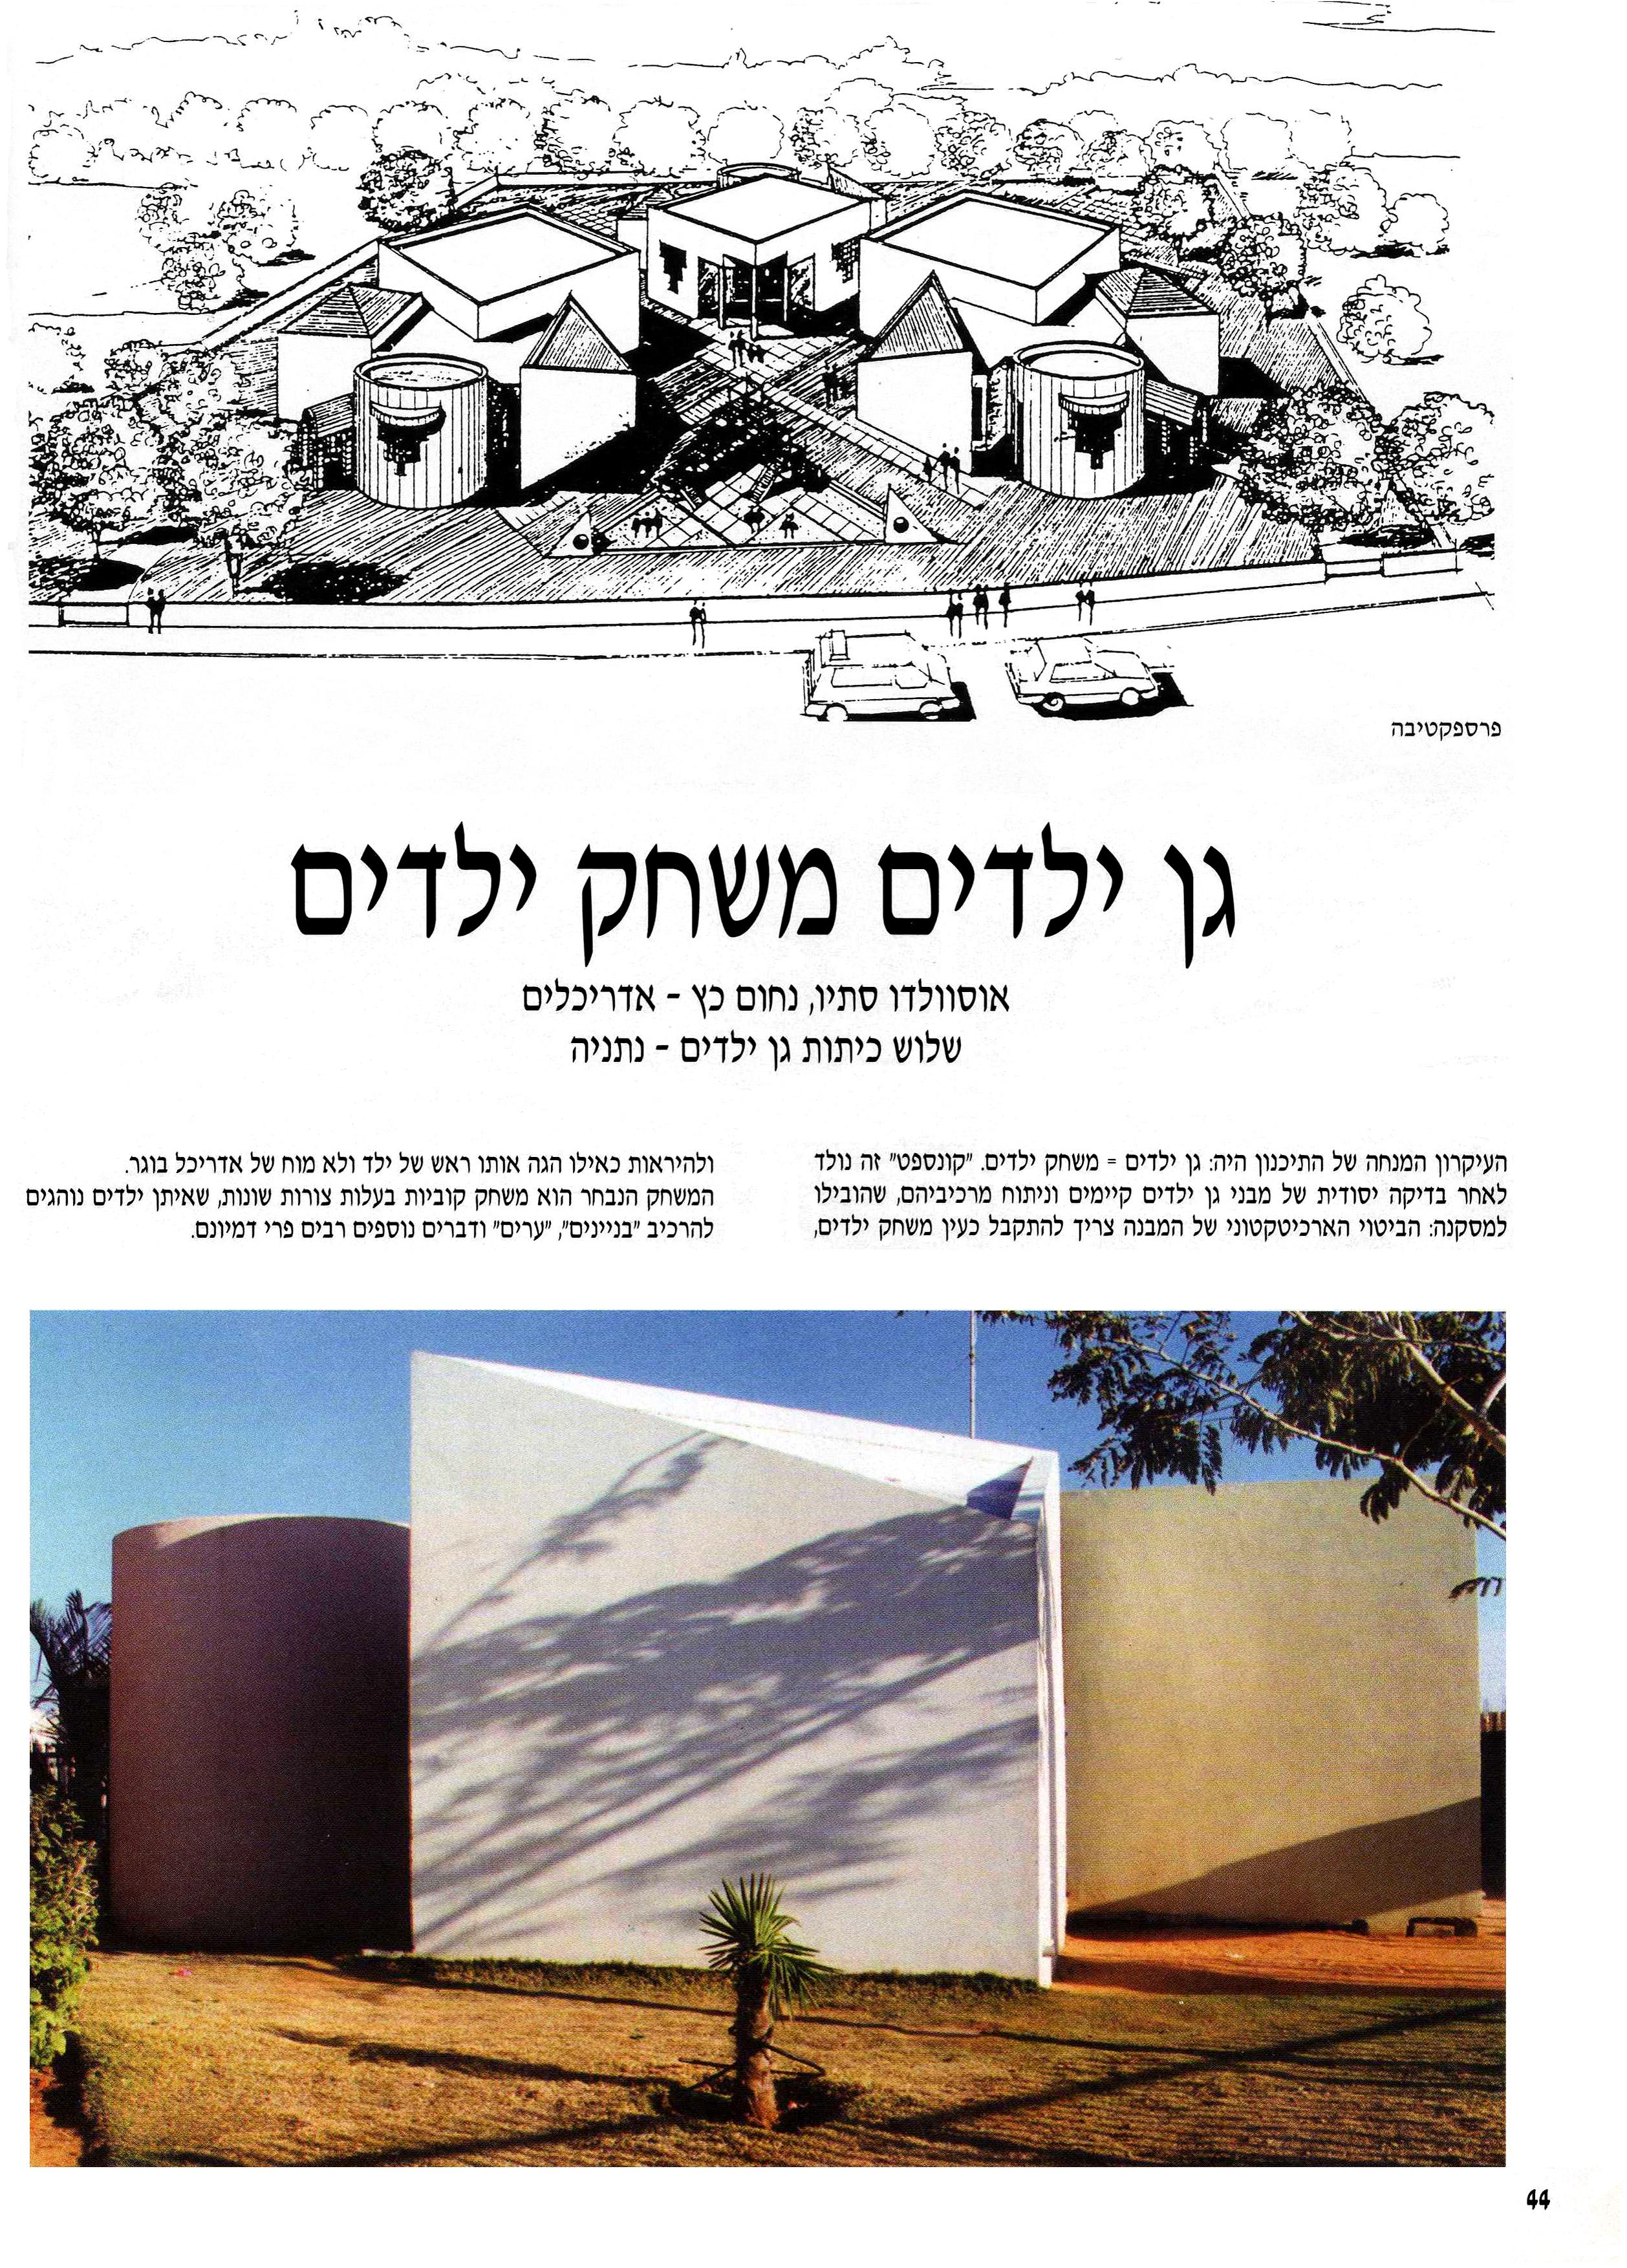 Kindergarten - Netanya